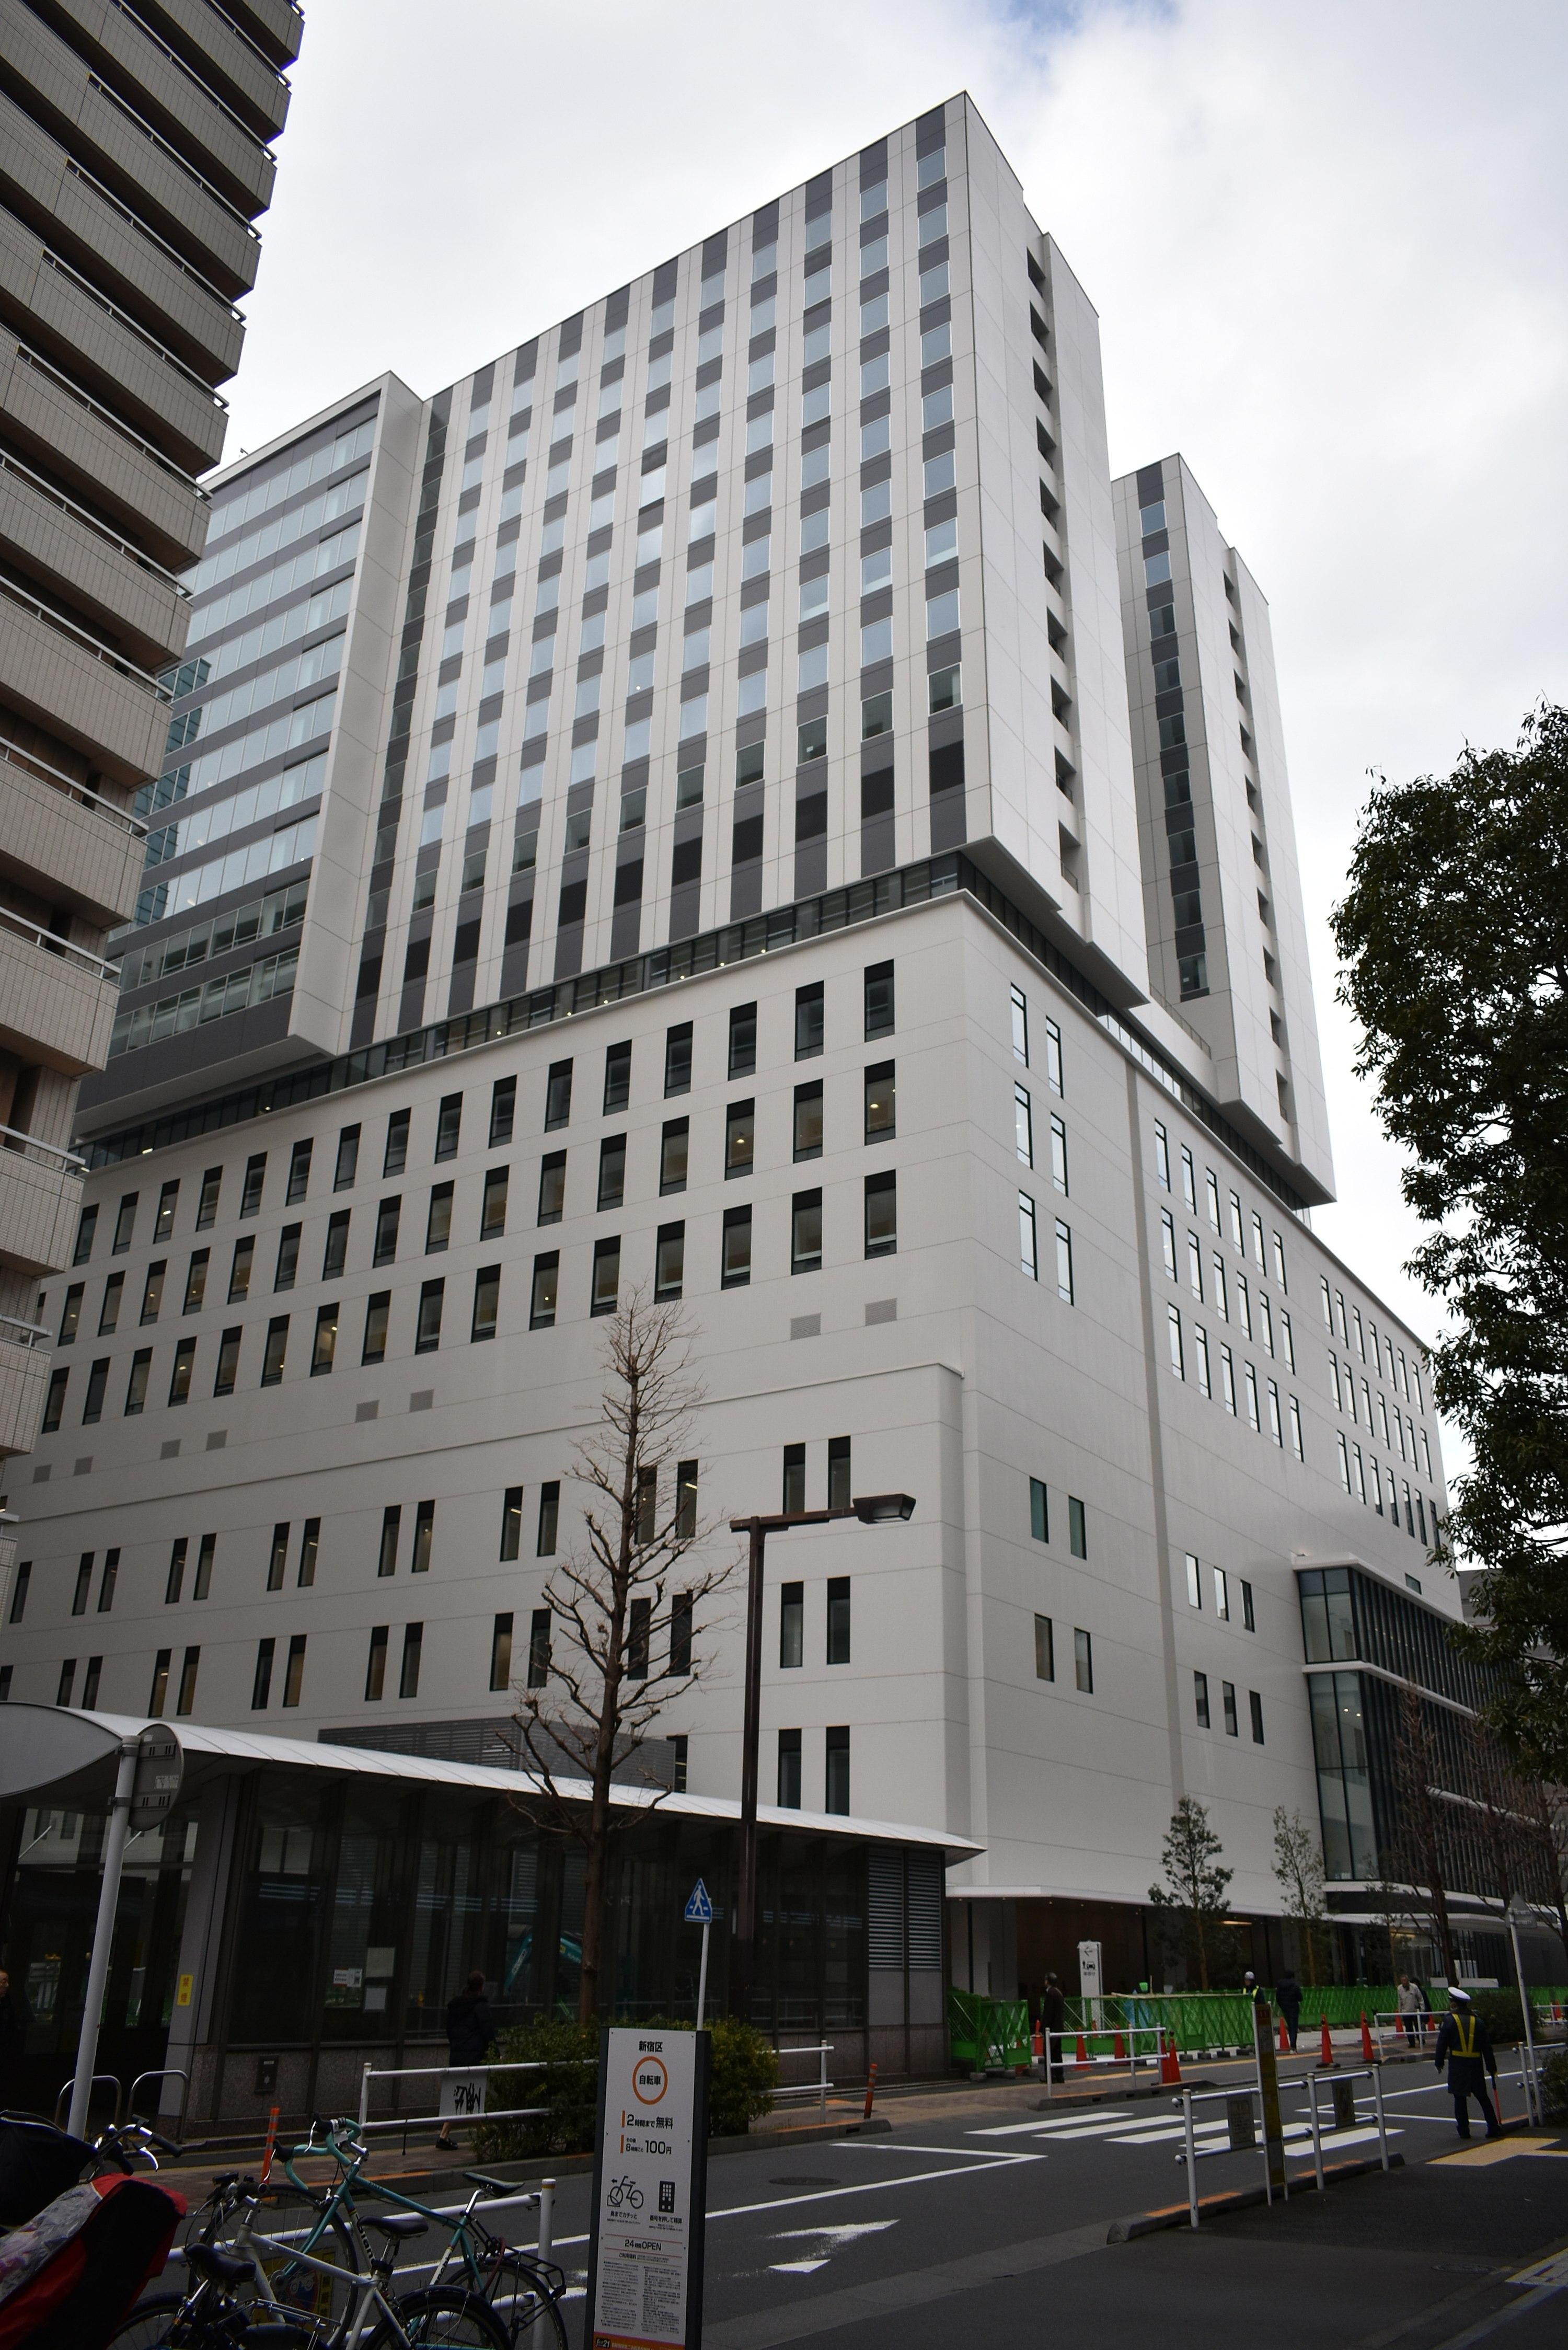 File:Tokyo Medical University Hospital 2019c jpg - Wikimedia